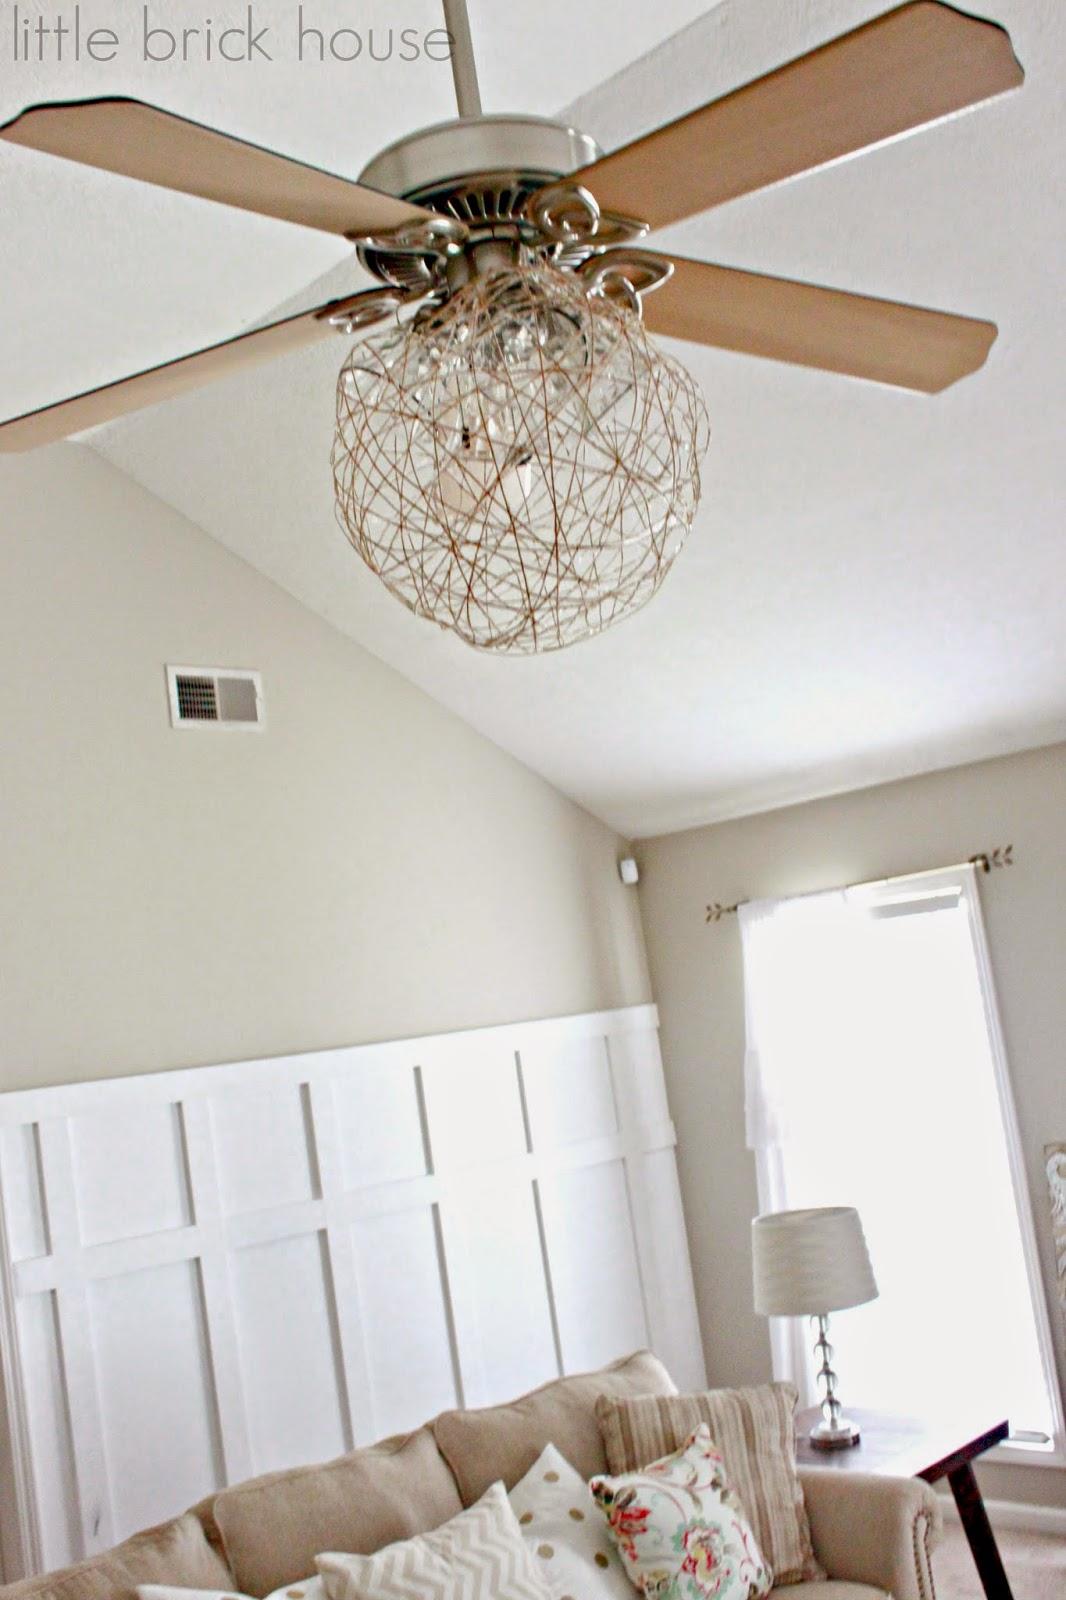 Little Brick House Ceiling Fan Makeover